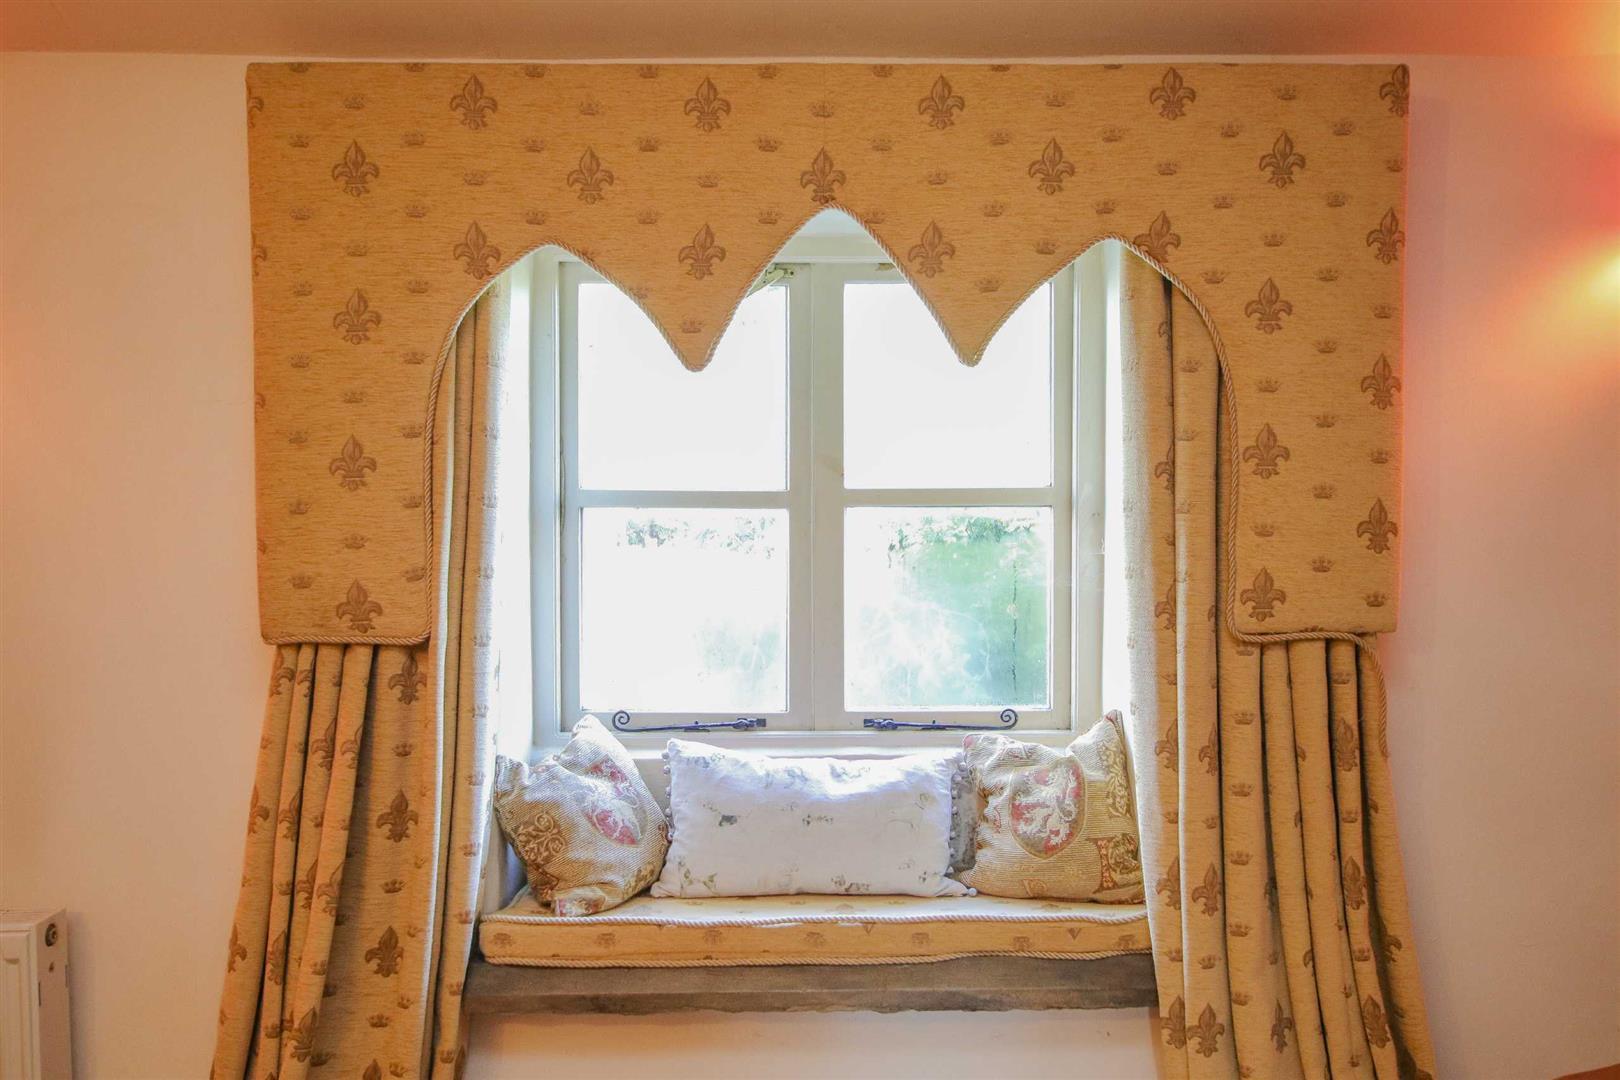 3 Bedroom Semi-detached House For Sale - p038856_20.jpg